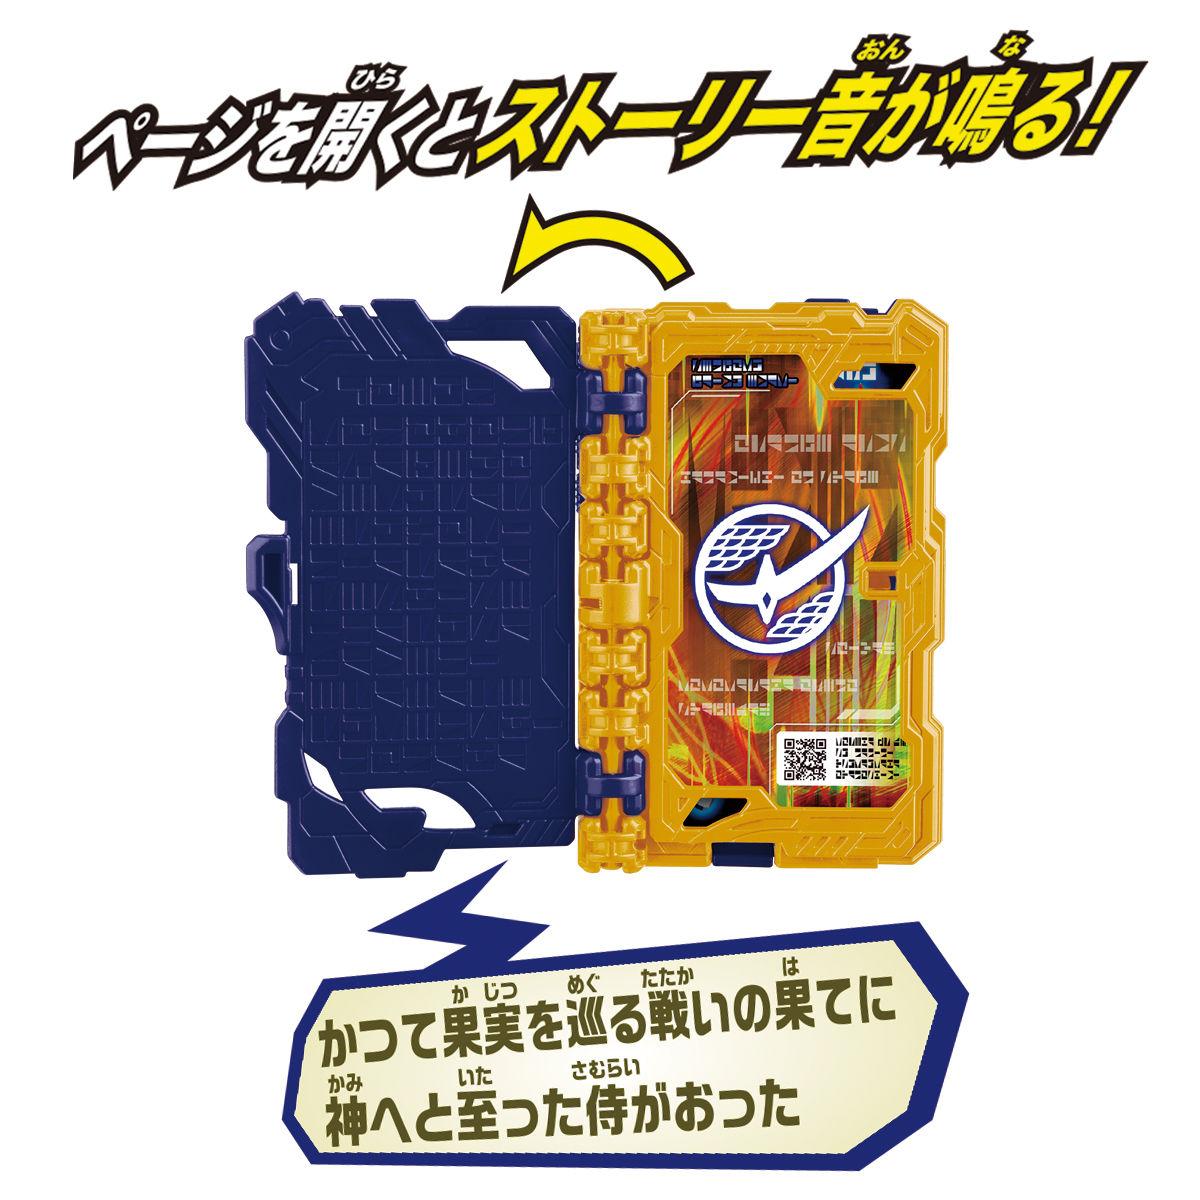 DX戦国鎧武絵巻ワンダーライドブック